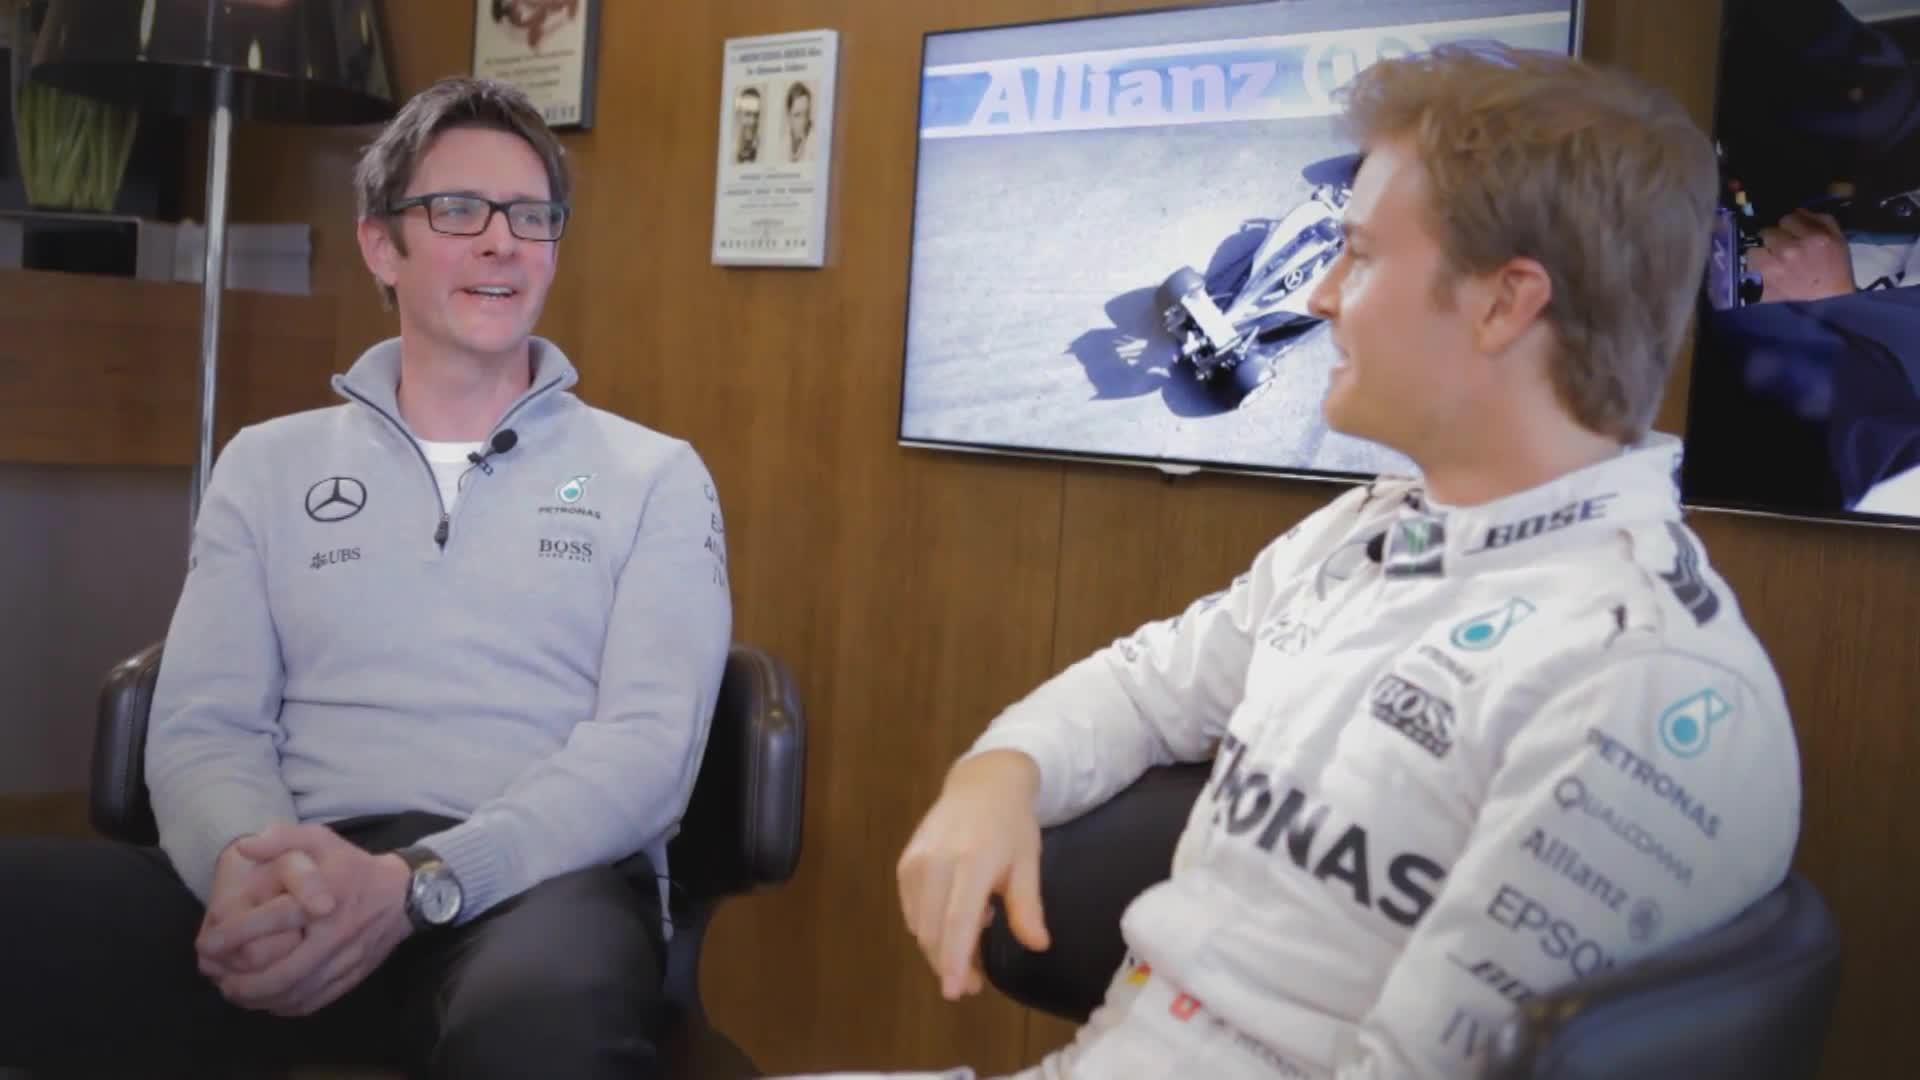 F1 Großen Preis Von Monaco - Nico Rosberg - Risiko Management in Monaco